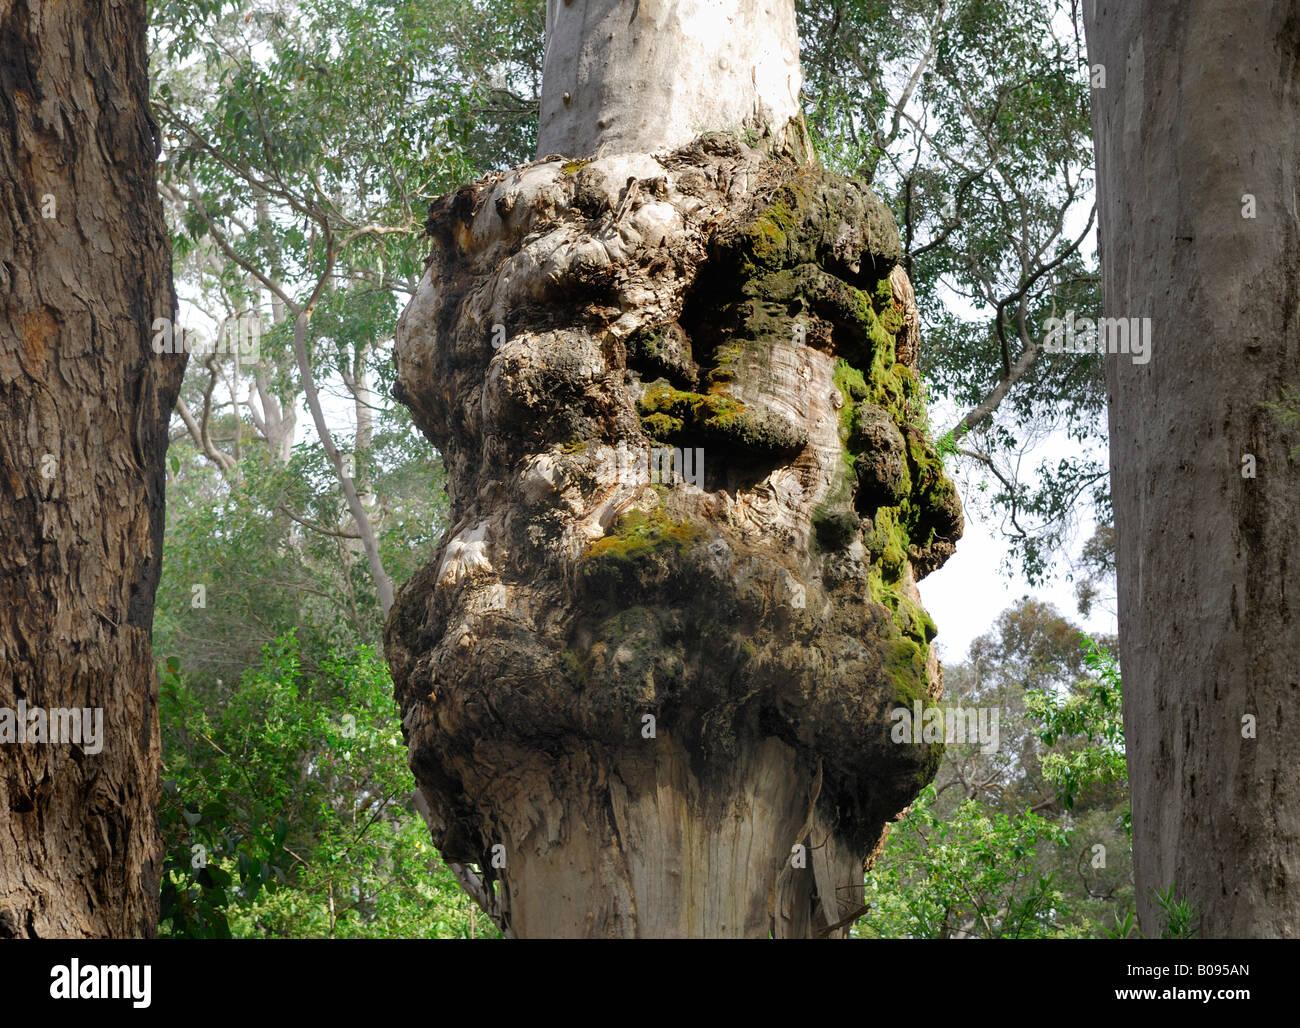 Tree cancer, diseased Karri Tree (Eucalyptus diversicolor), Warren National Park near Pemberton, Western Australia - Stock Image